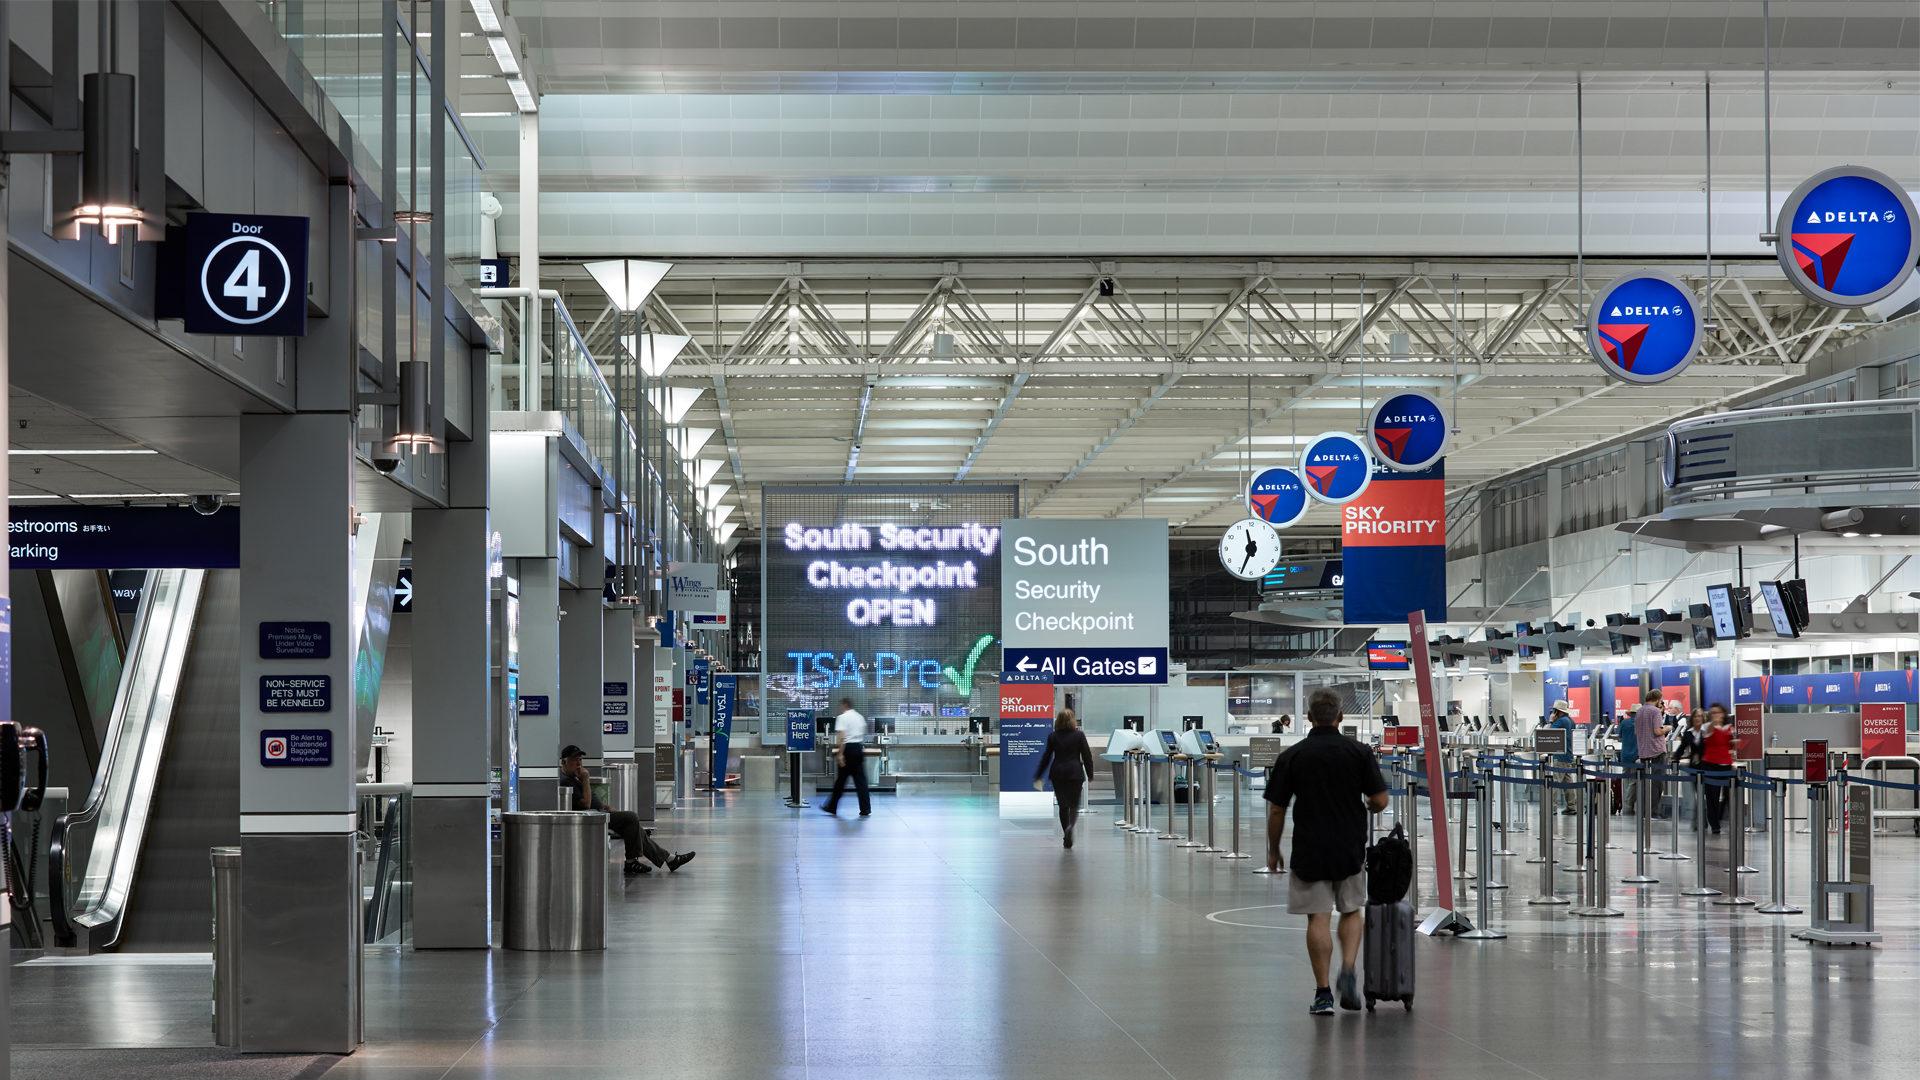 MAC T2-Humphrey Terminal Bloomington_South Security Check Point